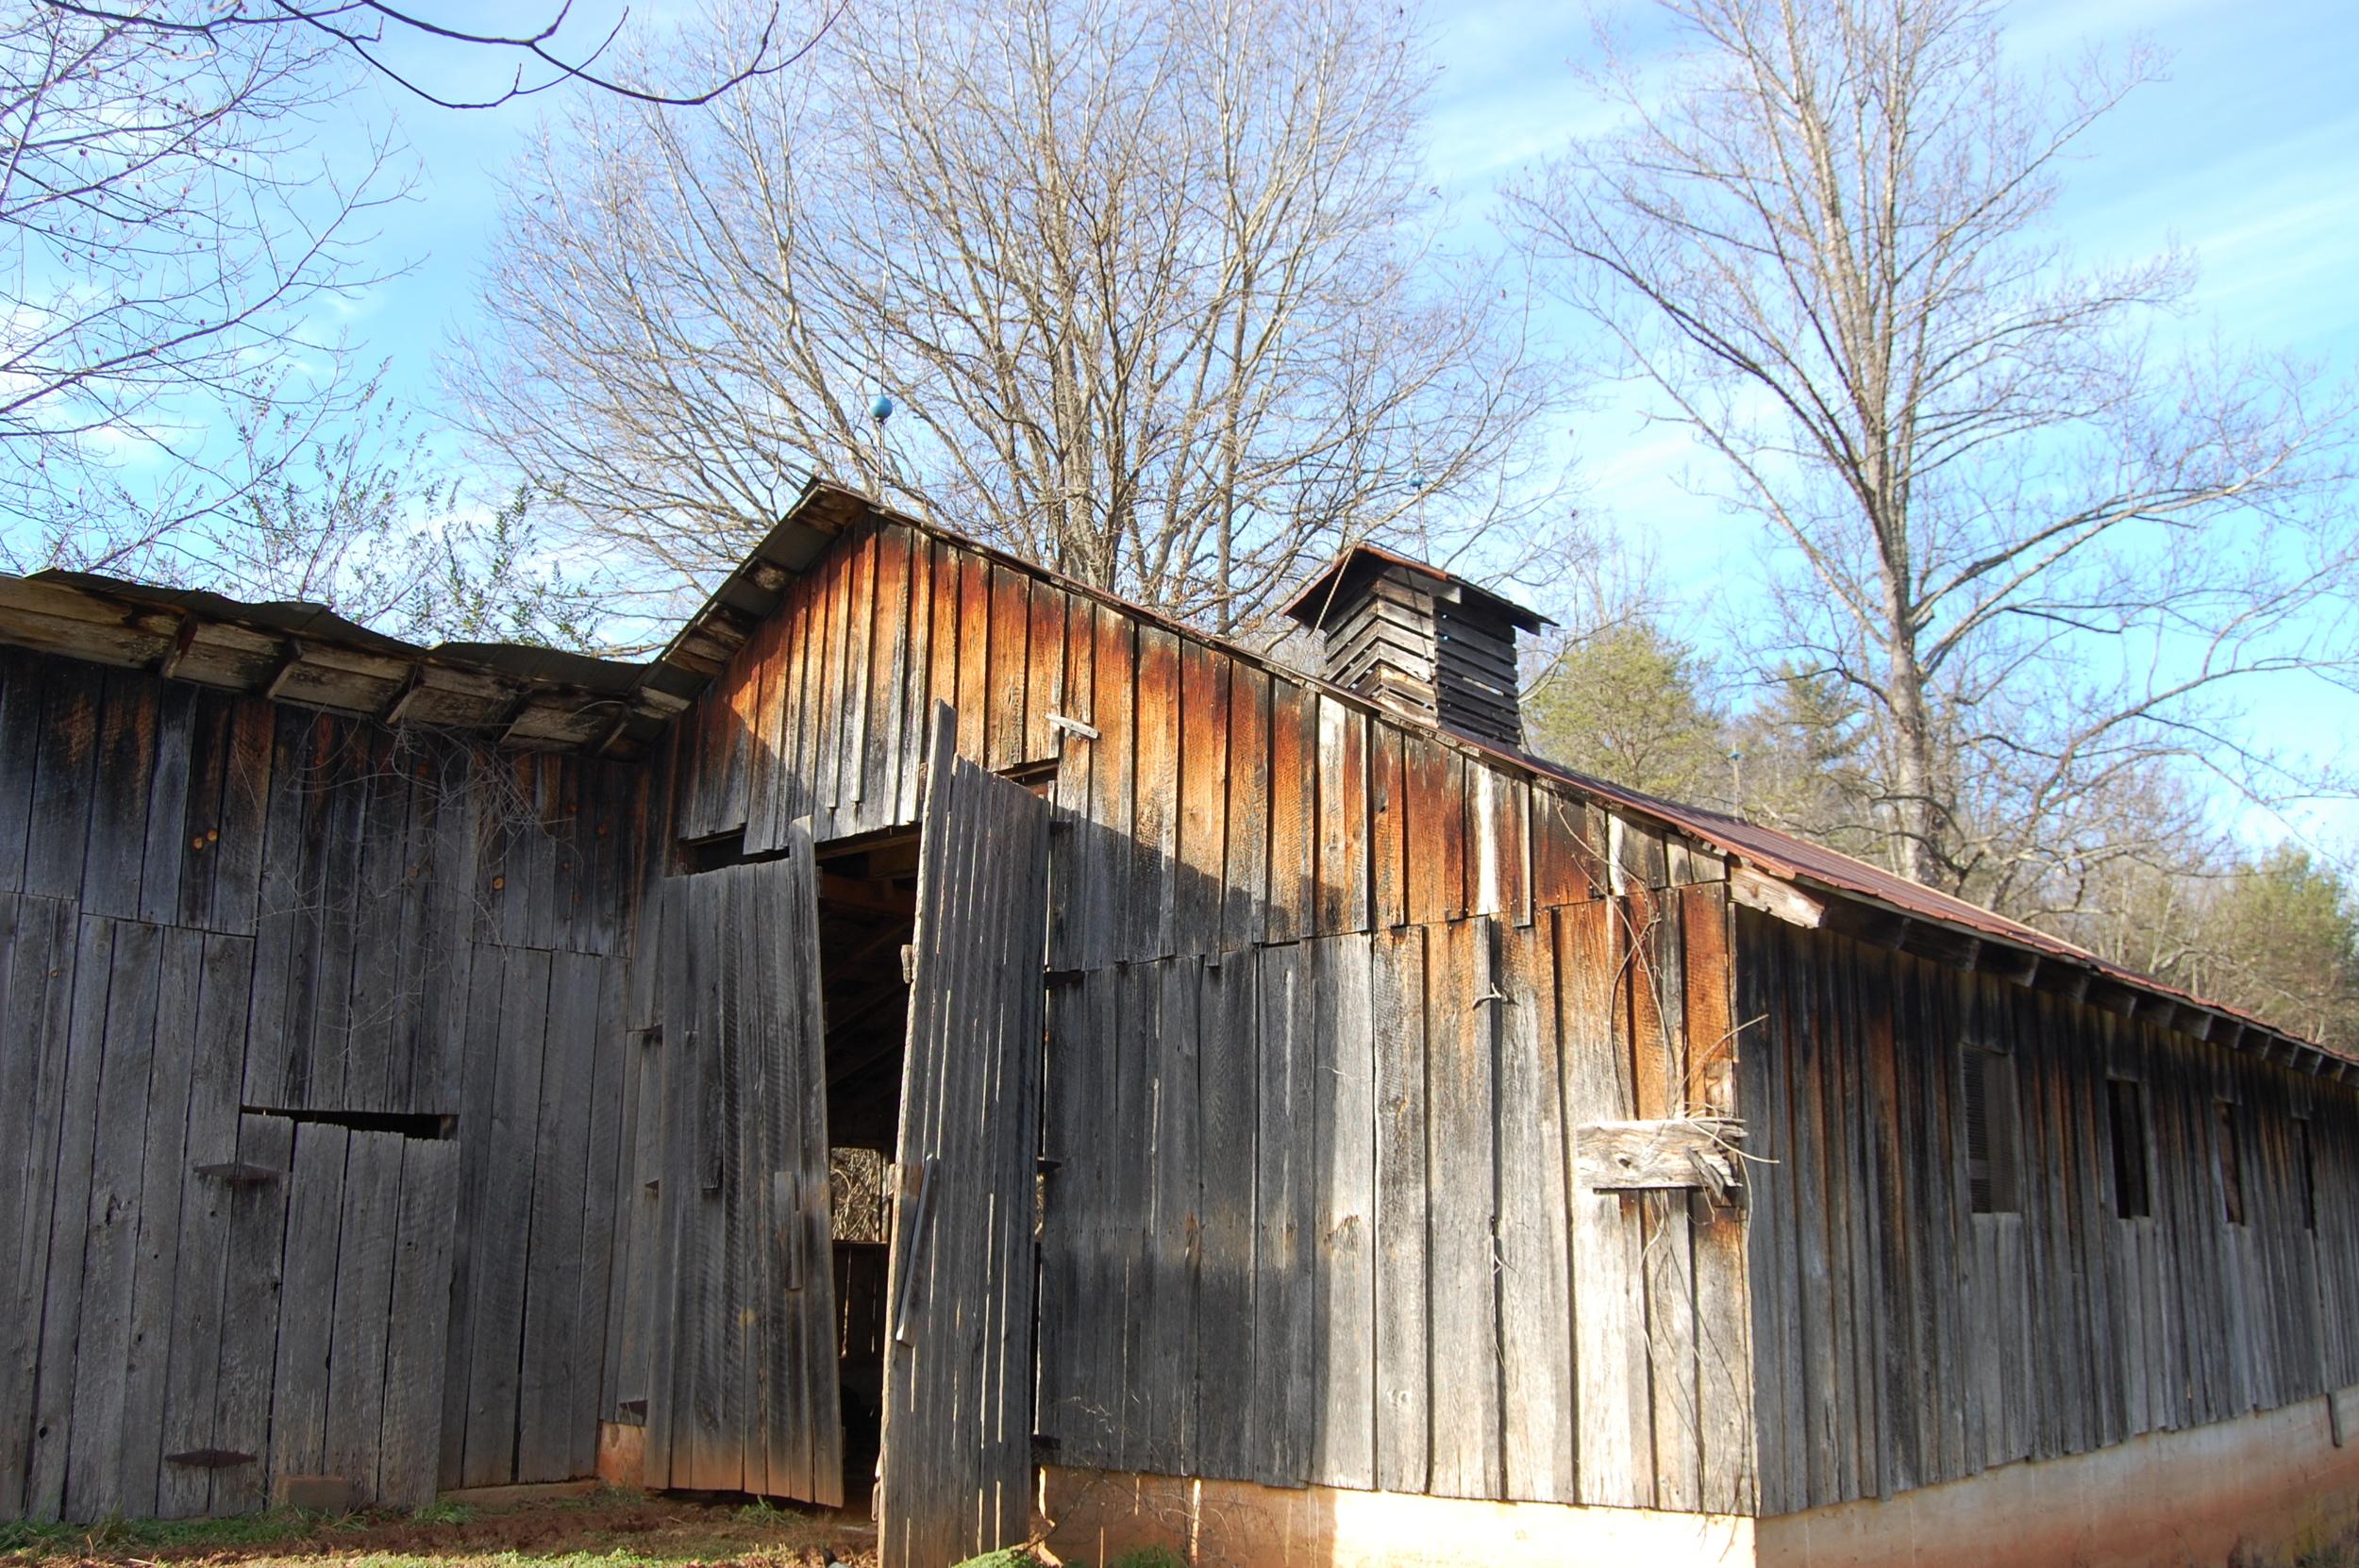 The dairy barn